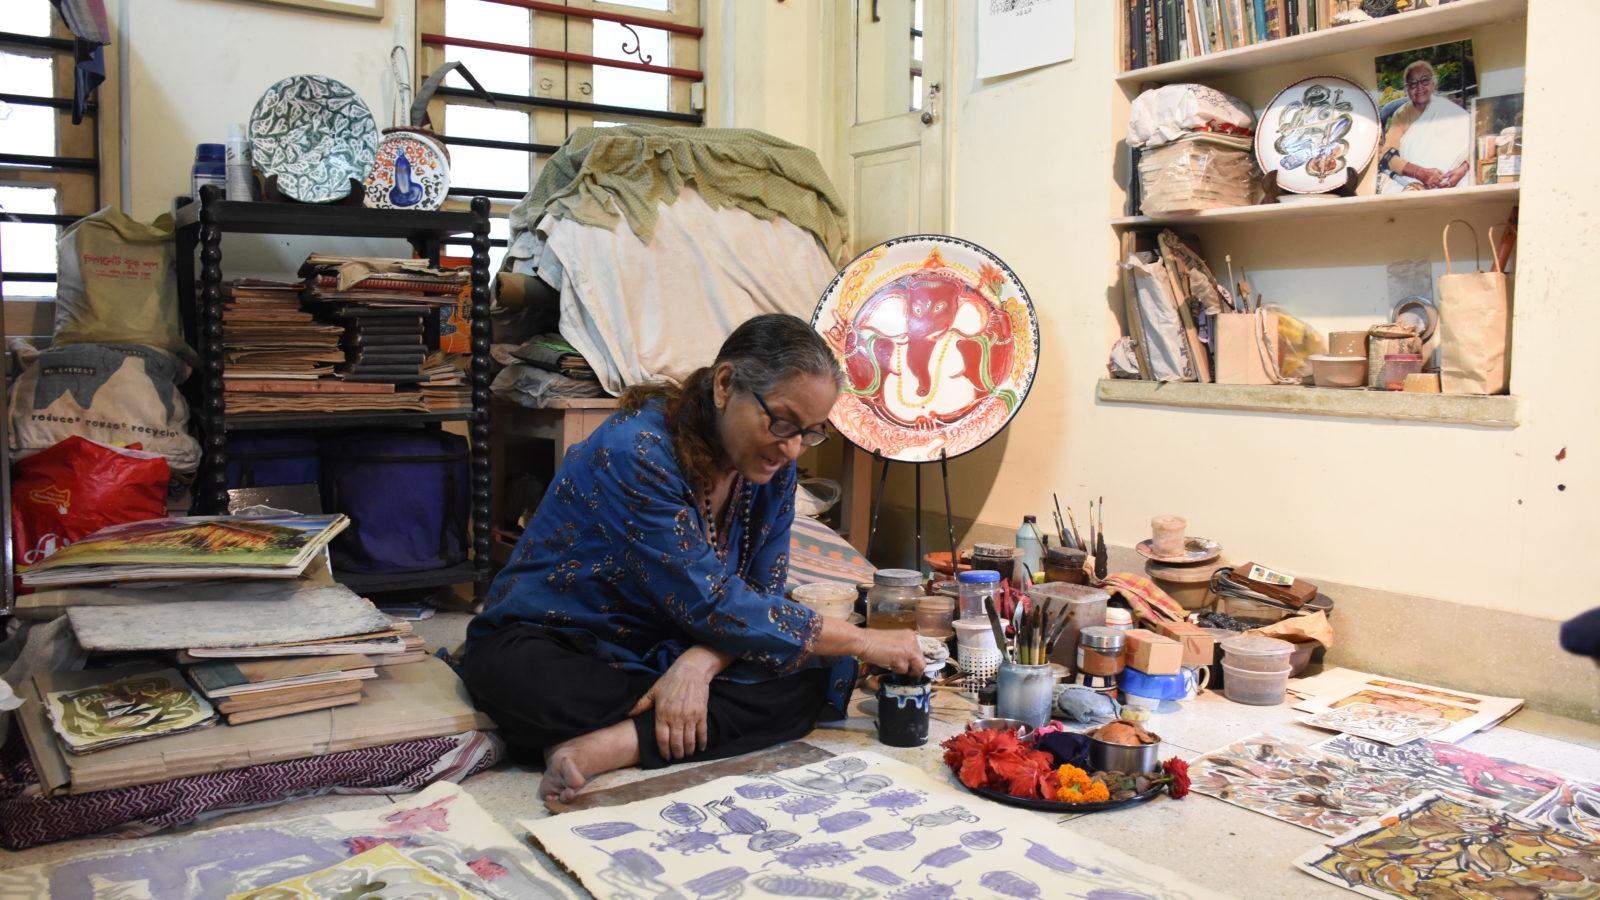 Arunima Chowdhury in her Kolkata studio, 2020. Courtesy of Emami Art